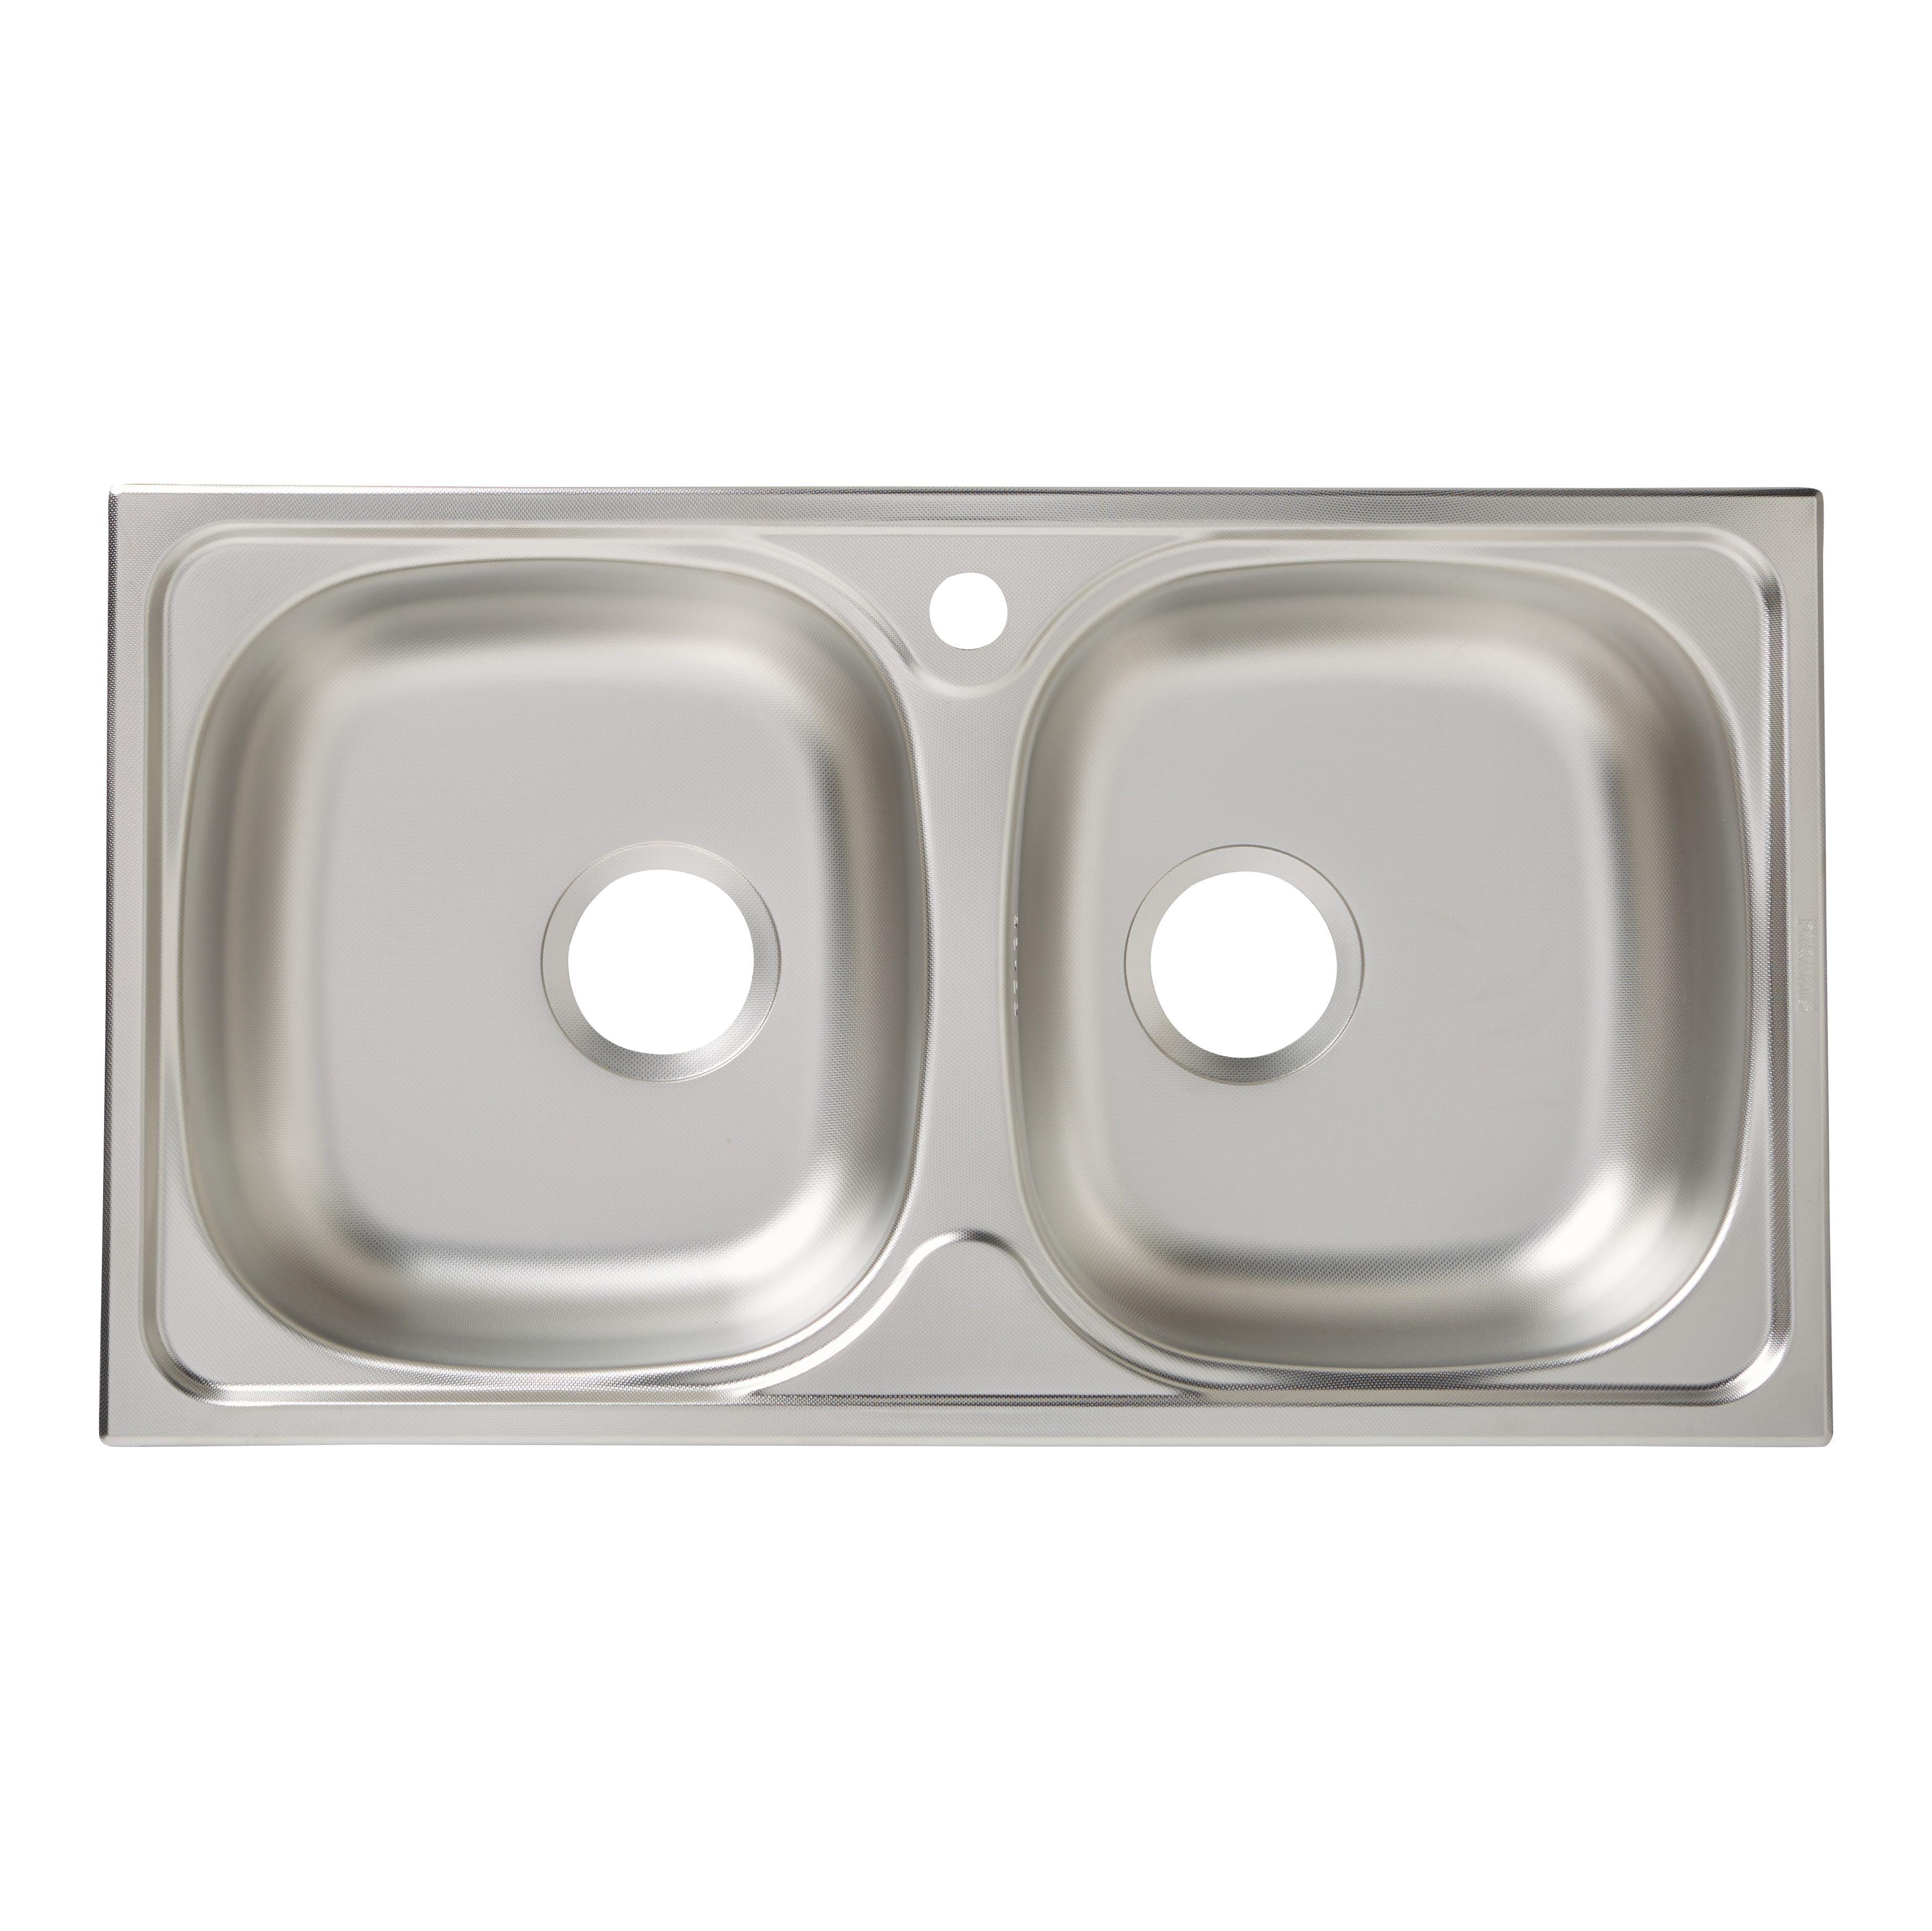 Franke Linen Finish Sinks : ... Lewis Jemison 1 Bowl Linen Finish Stainless Steel Round Sink & Drainer